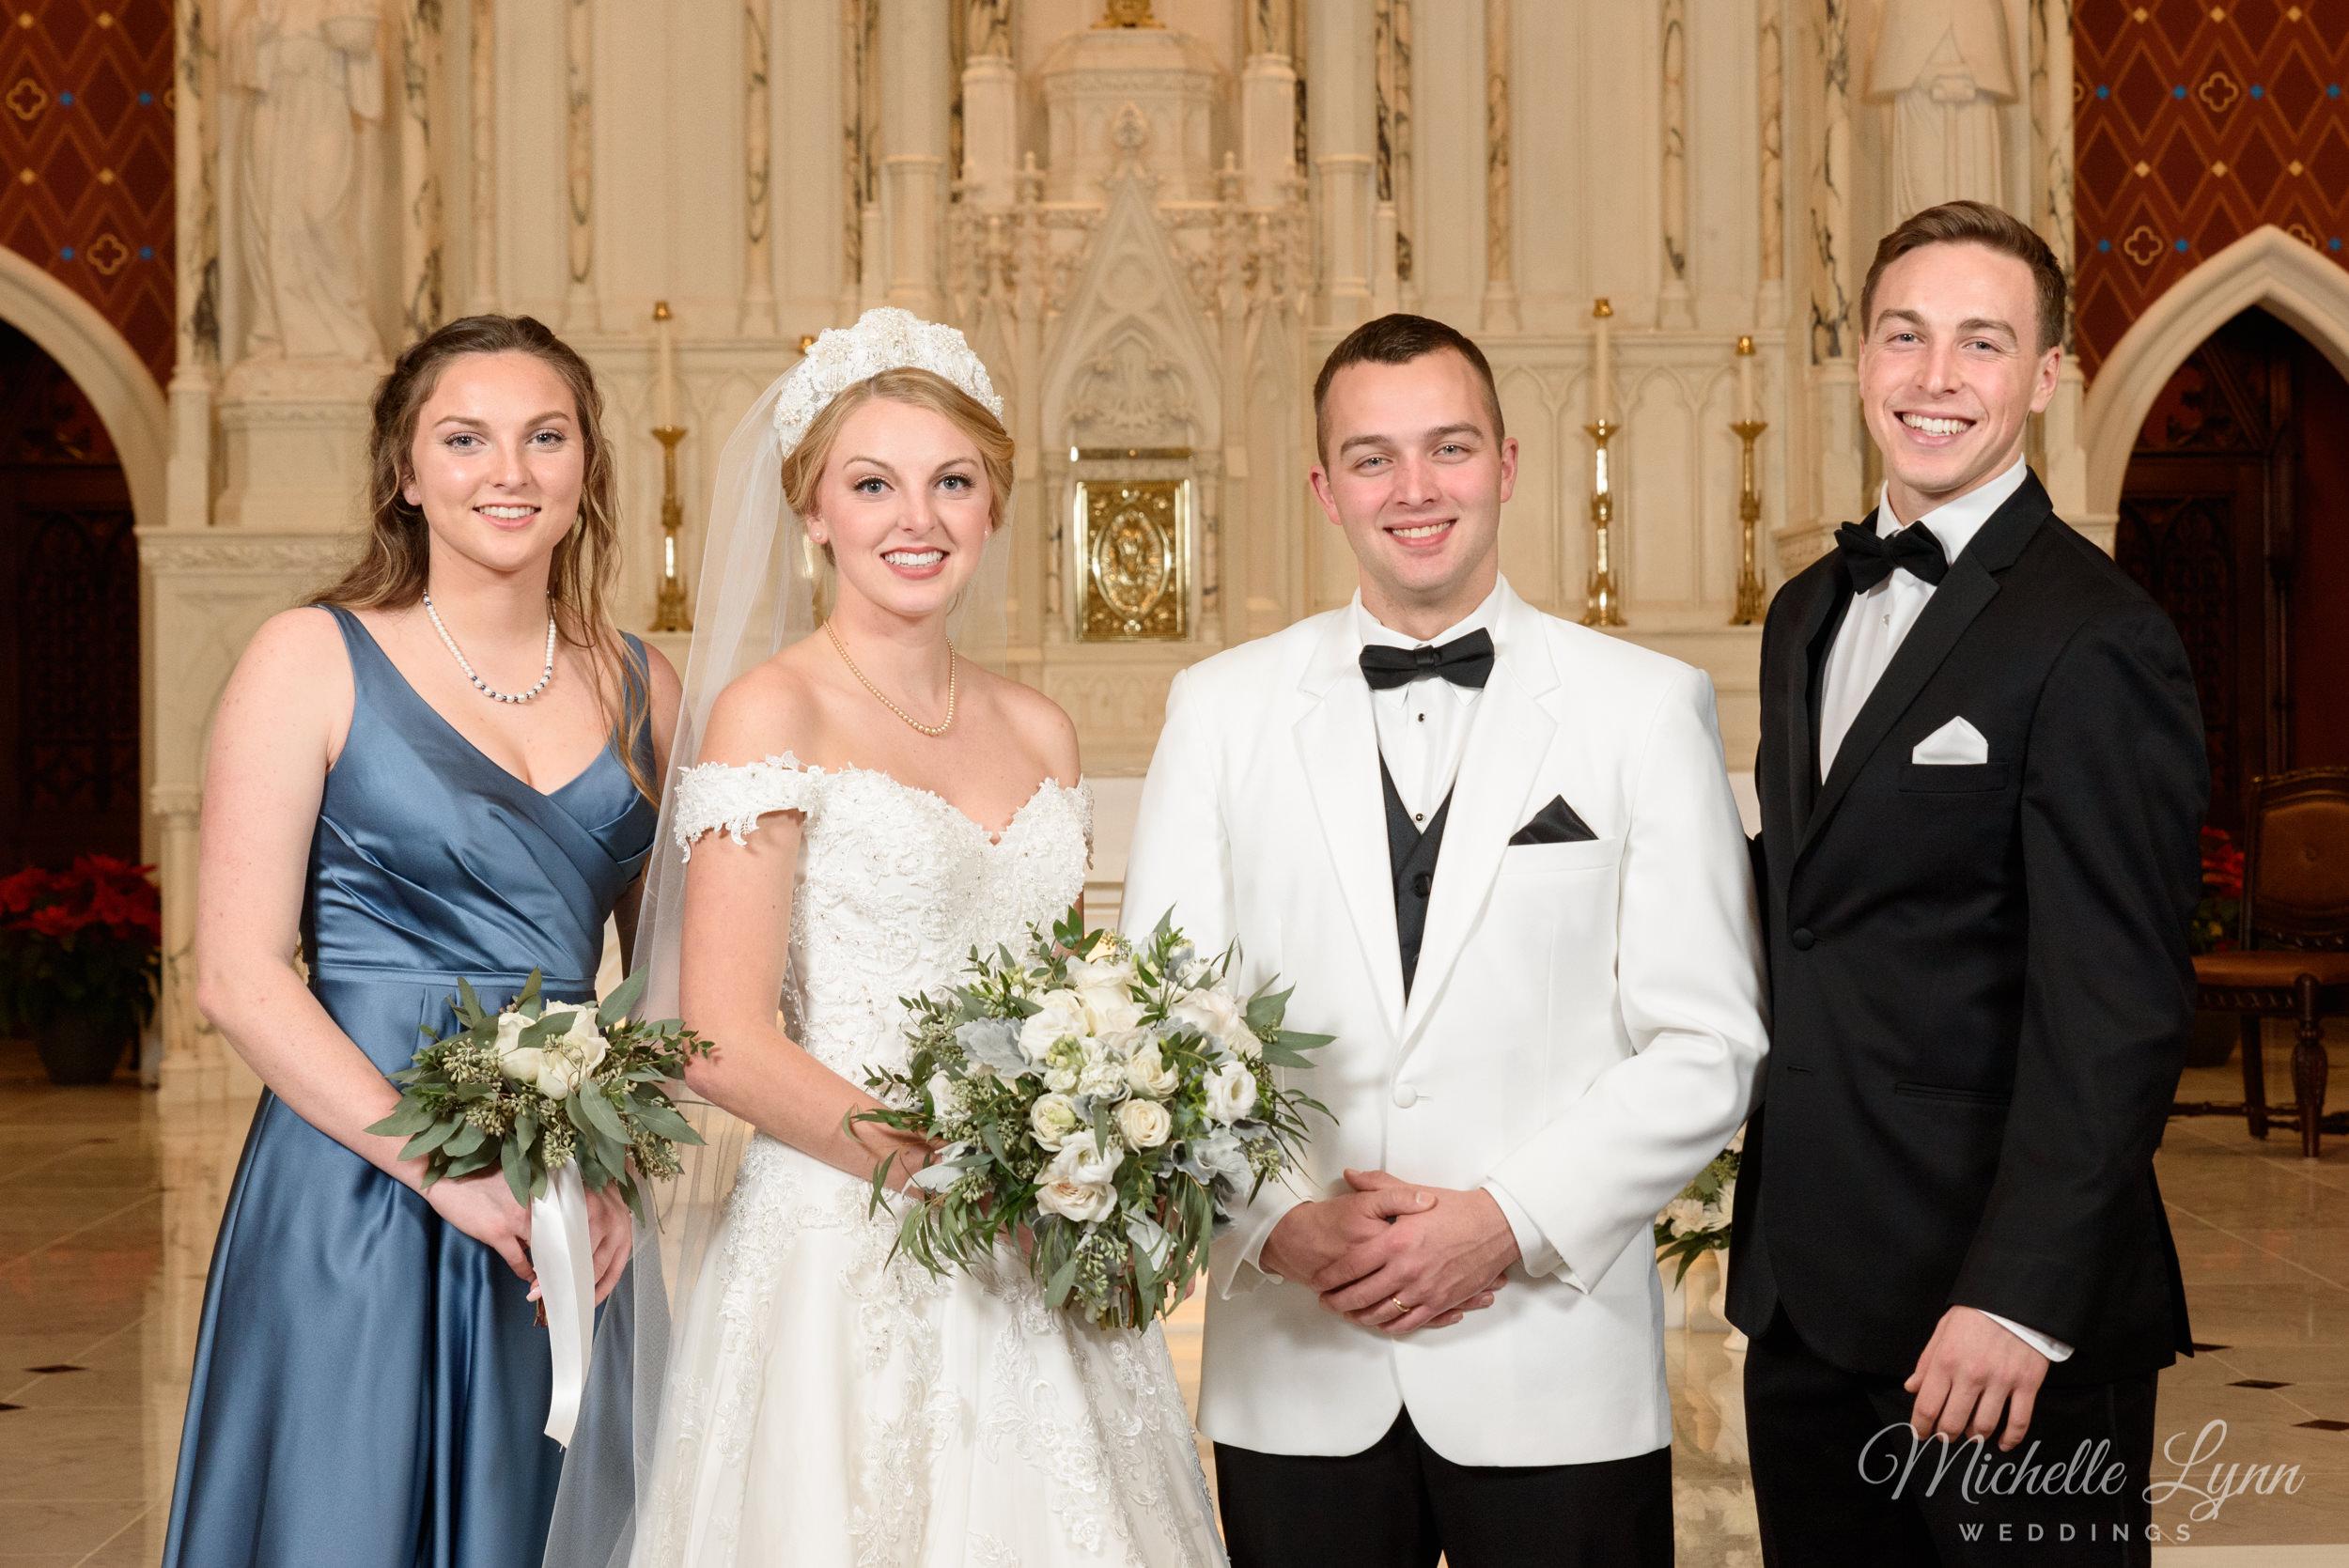 william-penn-inn-wedding-photography-mlw-66.jpg